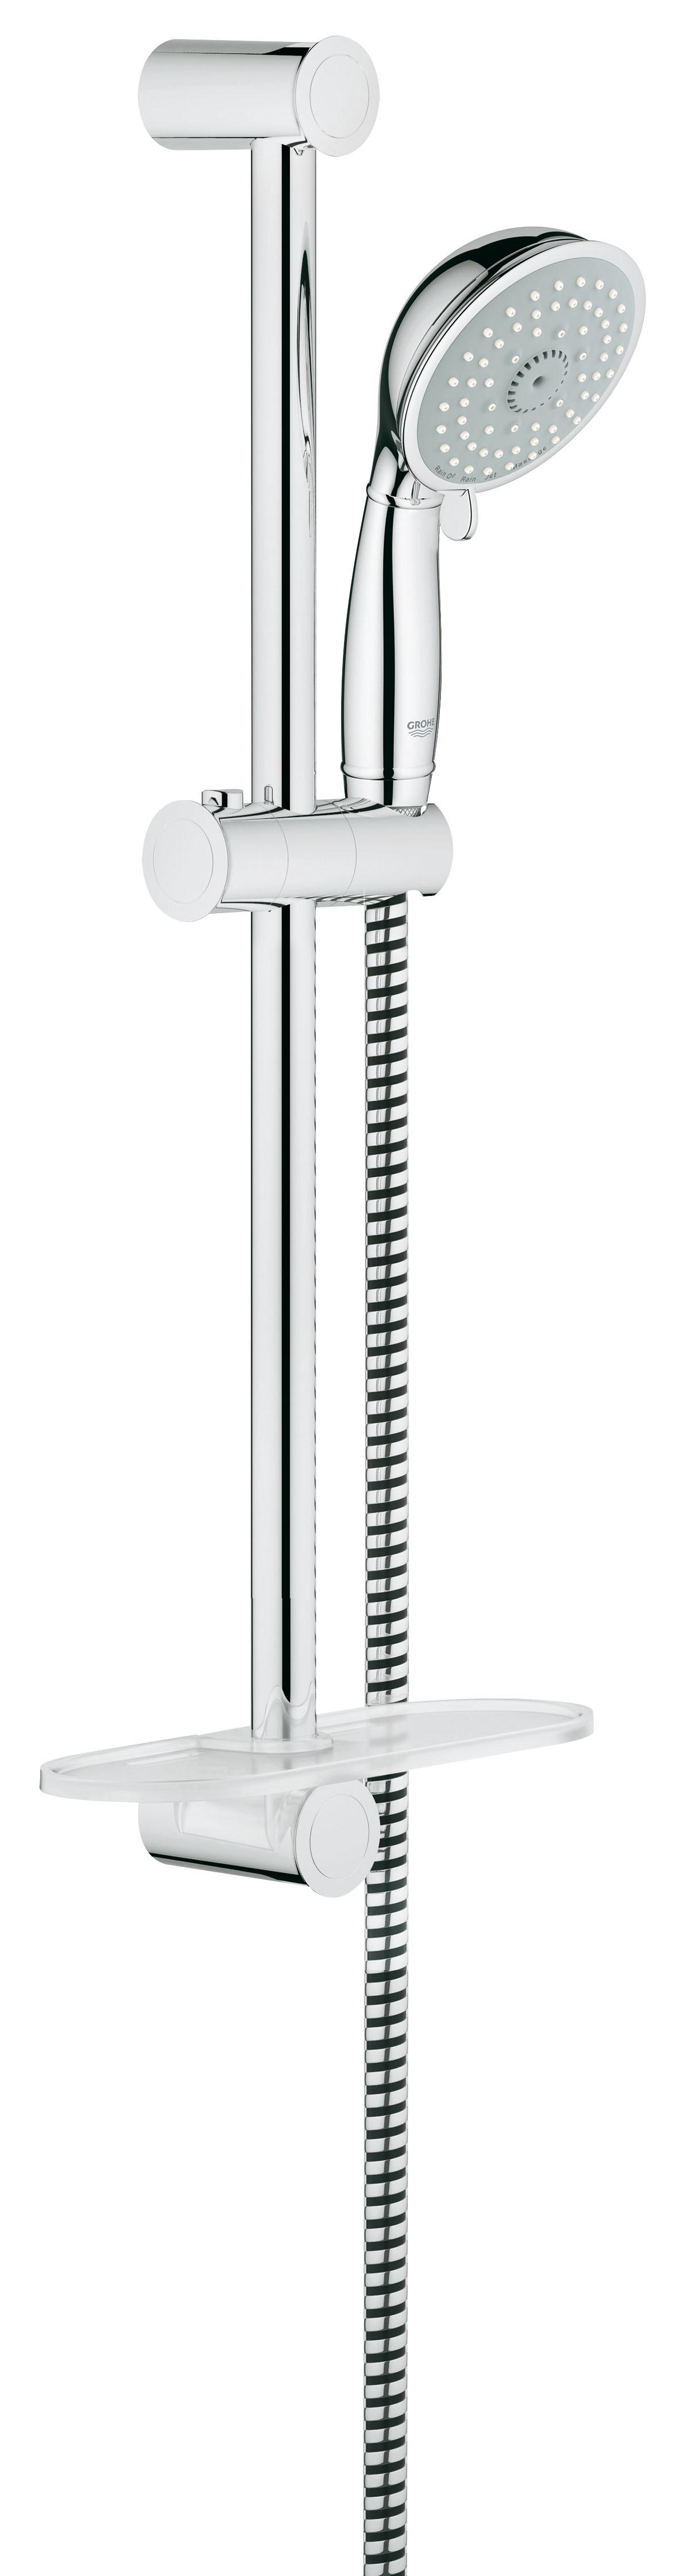 Душевой гарнитур Grohe 27609000 Tempesta Classic (ручной душ, штанга 600 мм, шланг 1750 мм), хром